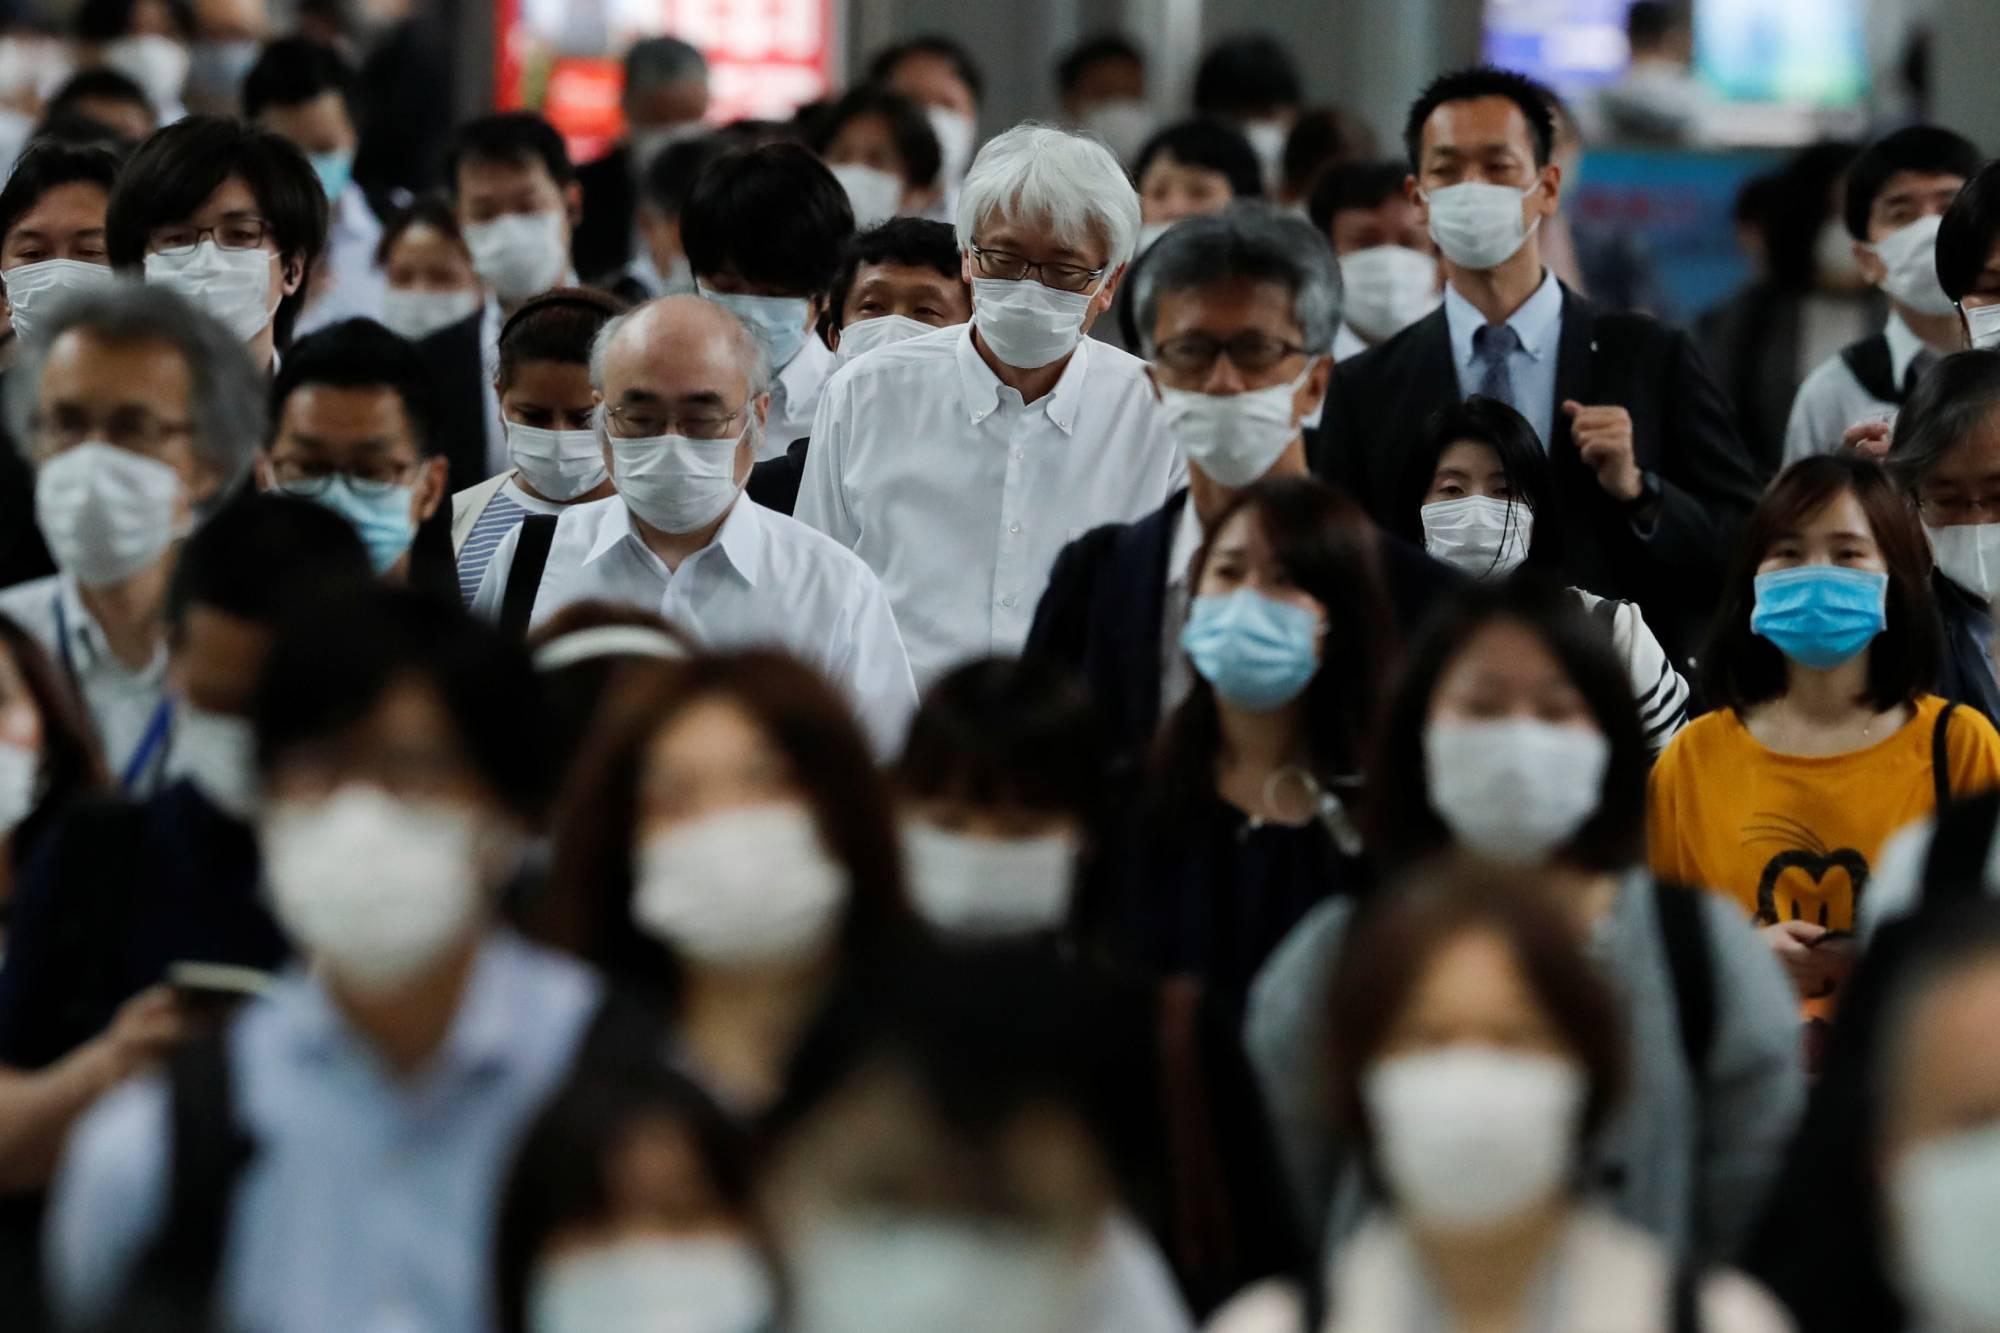 https: img.okezone.com content 2021 05 14 18 2410155 cdc-orang-yang-sudah-vaksinasi-covid-19-lengkap-tak-perlu-pakai-masker-di-ruangan-EjzgtfMHKh.jpeg